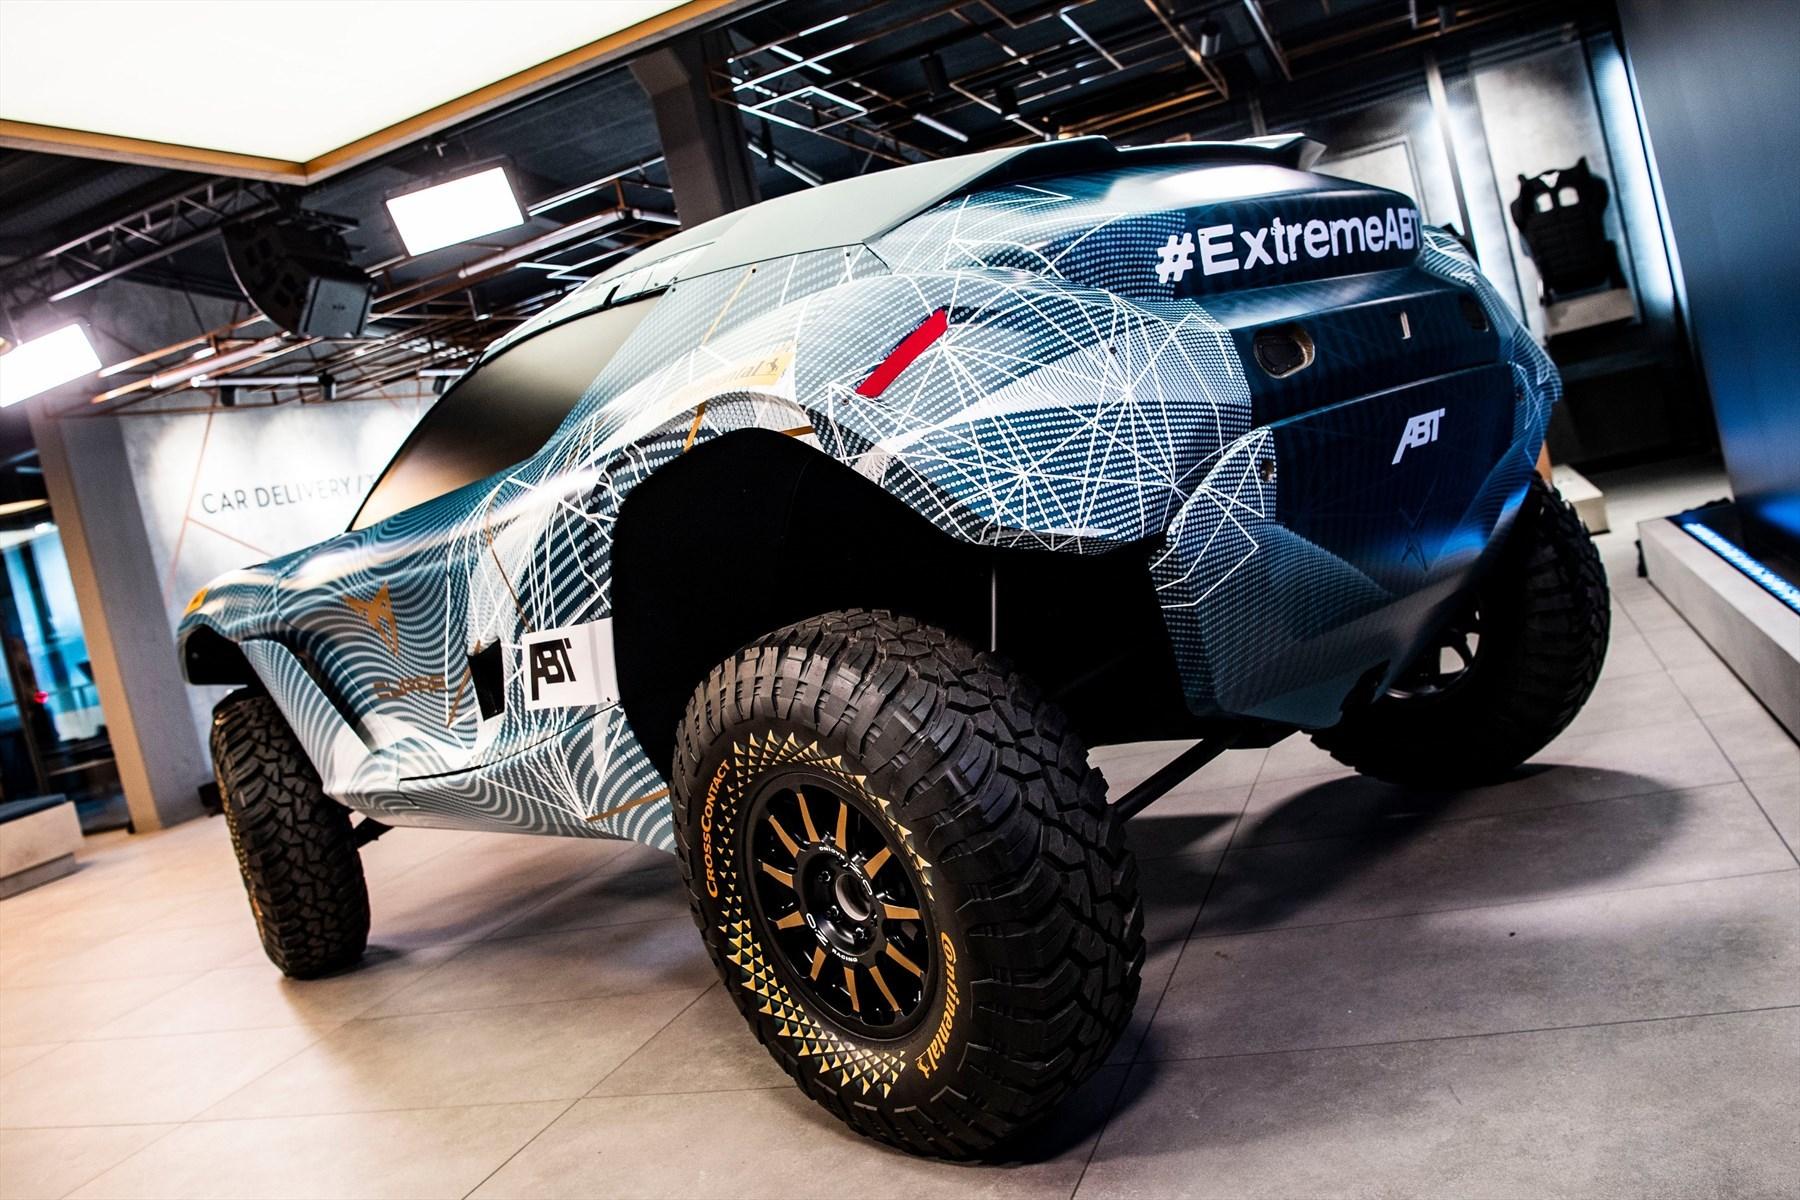 Continental, proveedor único de neumáticos del campeonato Extreme E